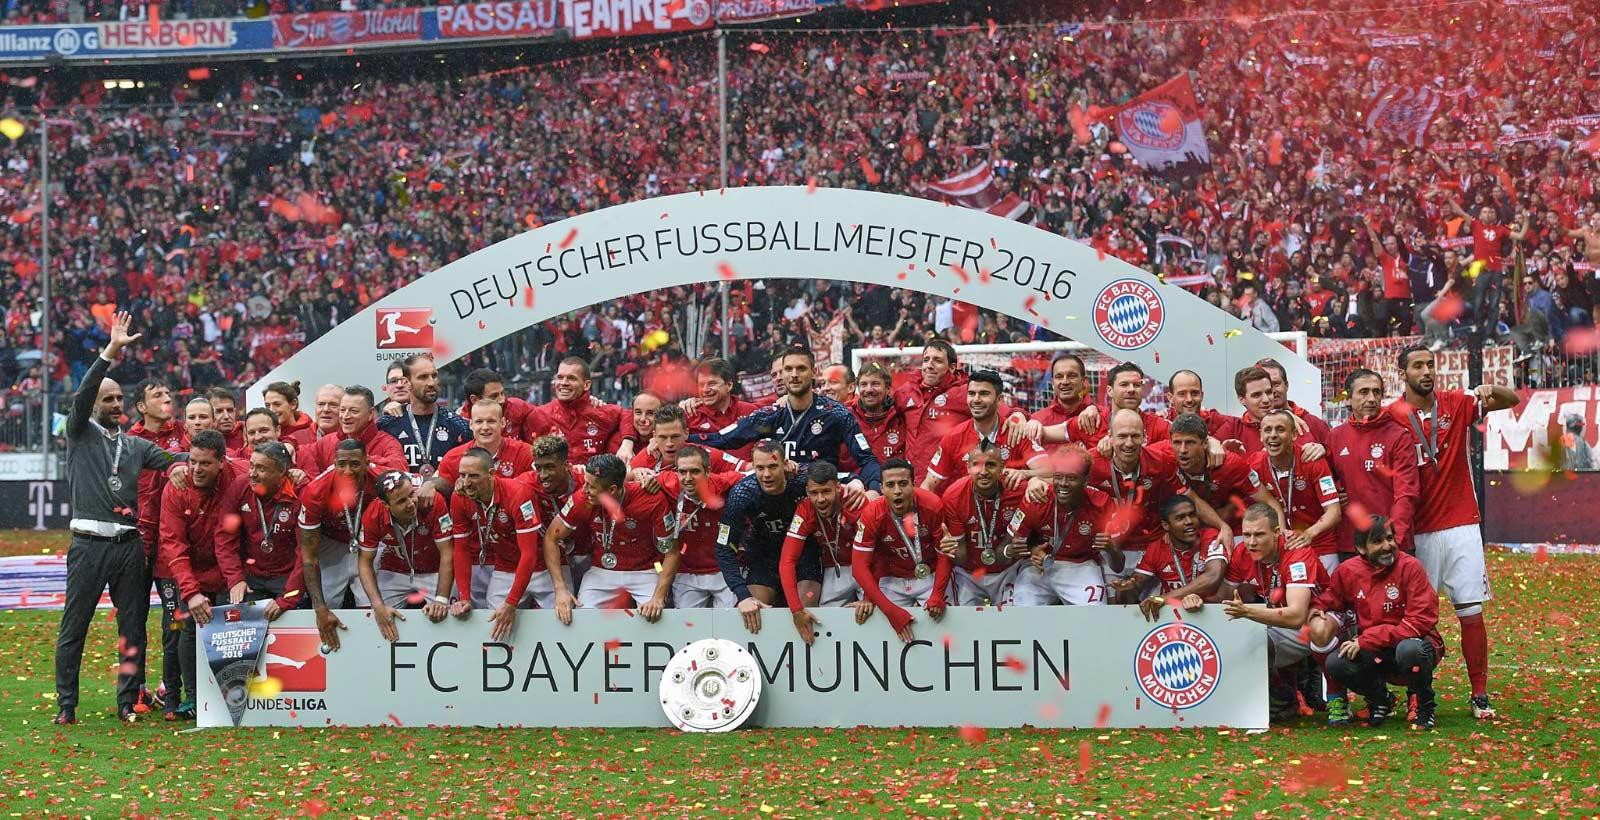 on-pitch-bayern-munich-16-17-home-kit_1.jpg